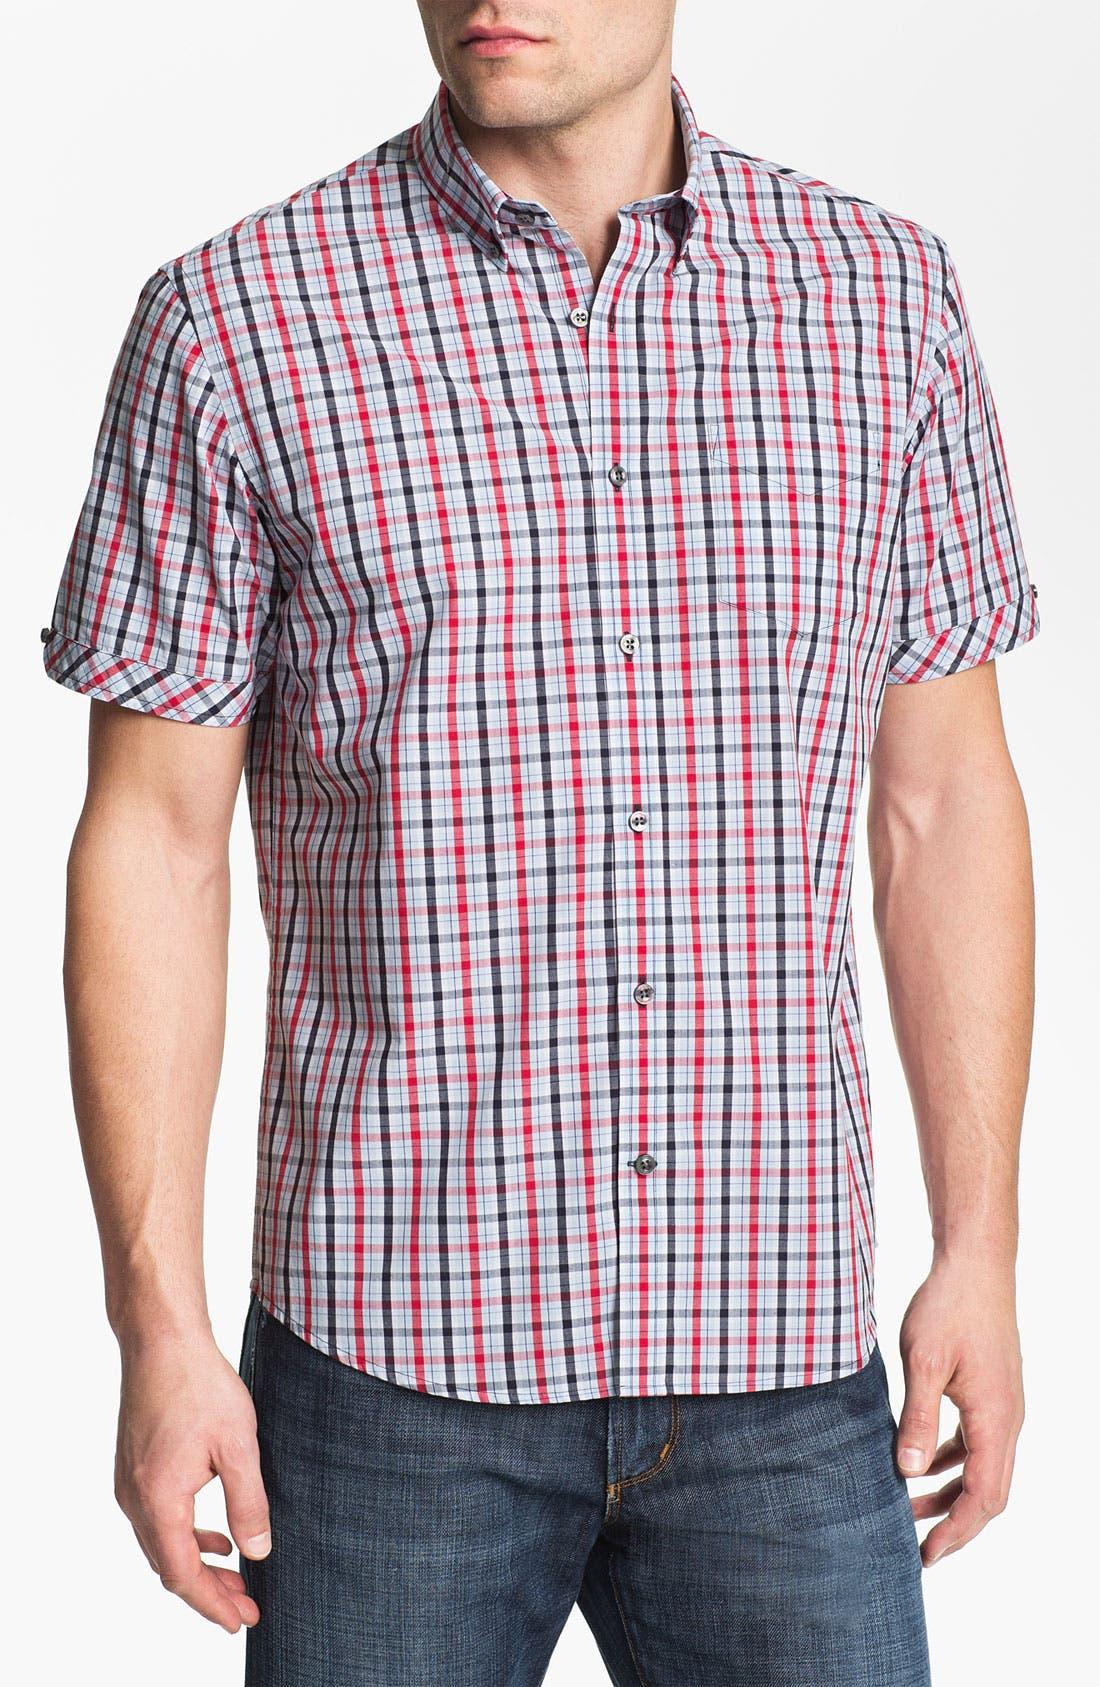 Alternate Image 1 Selected - James Campbell 'Ellis' Plaid Sport Shirt